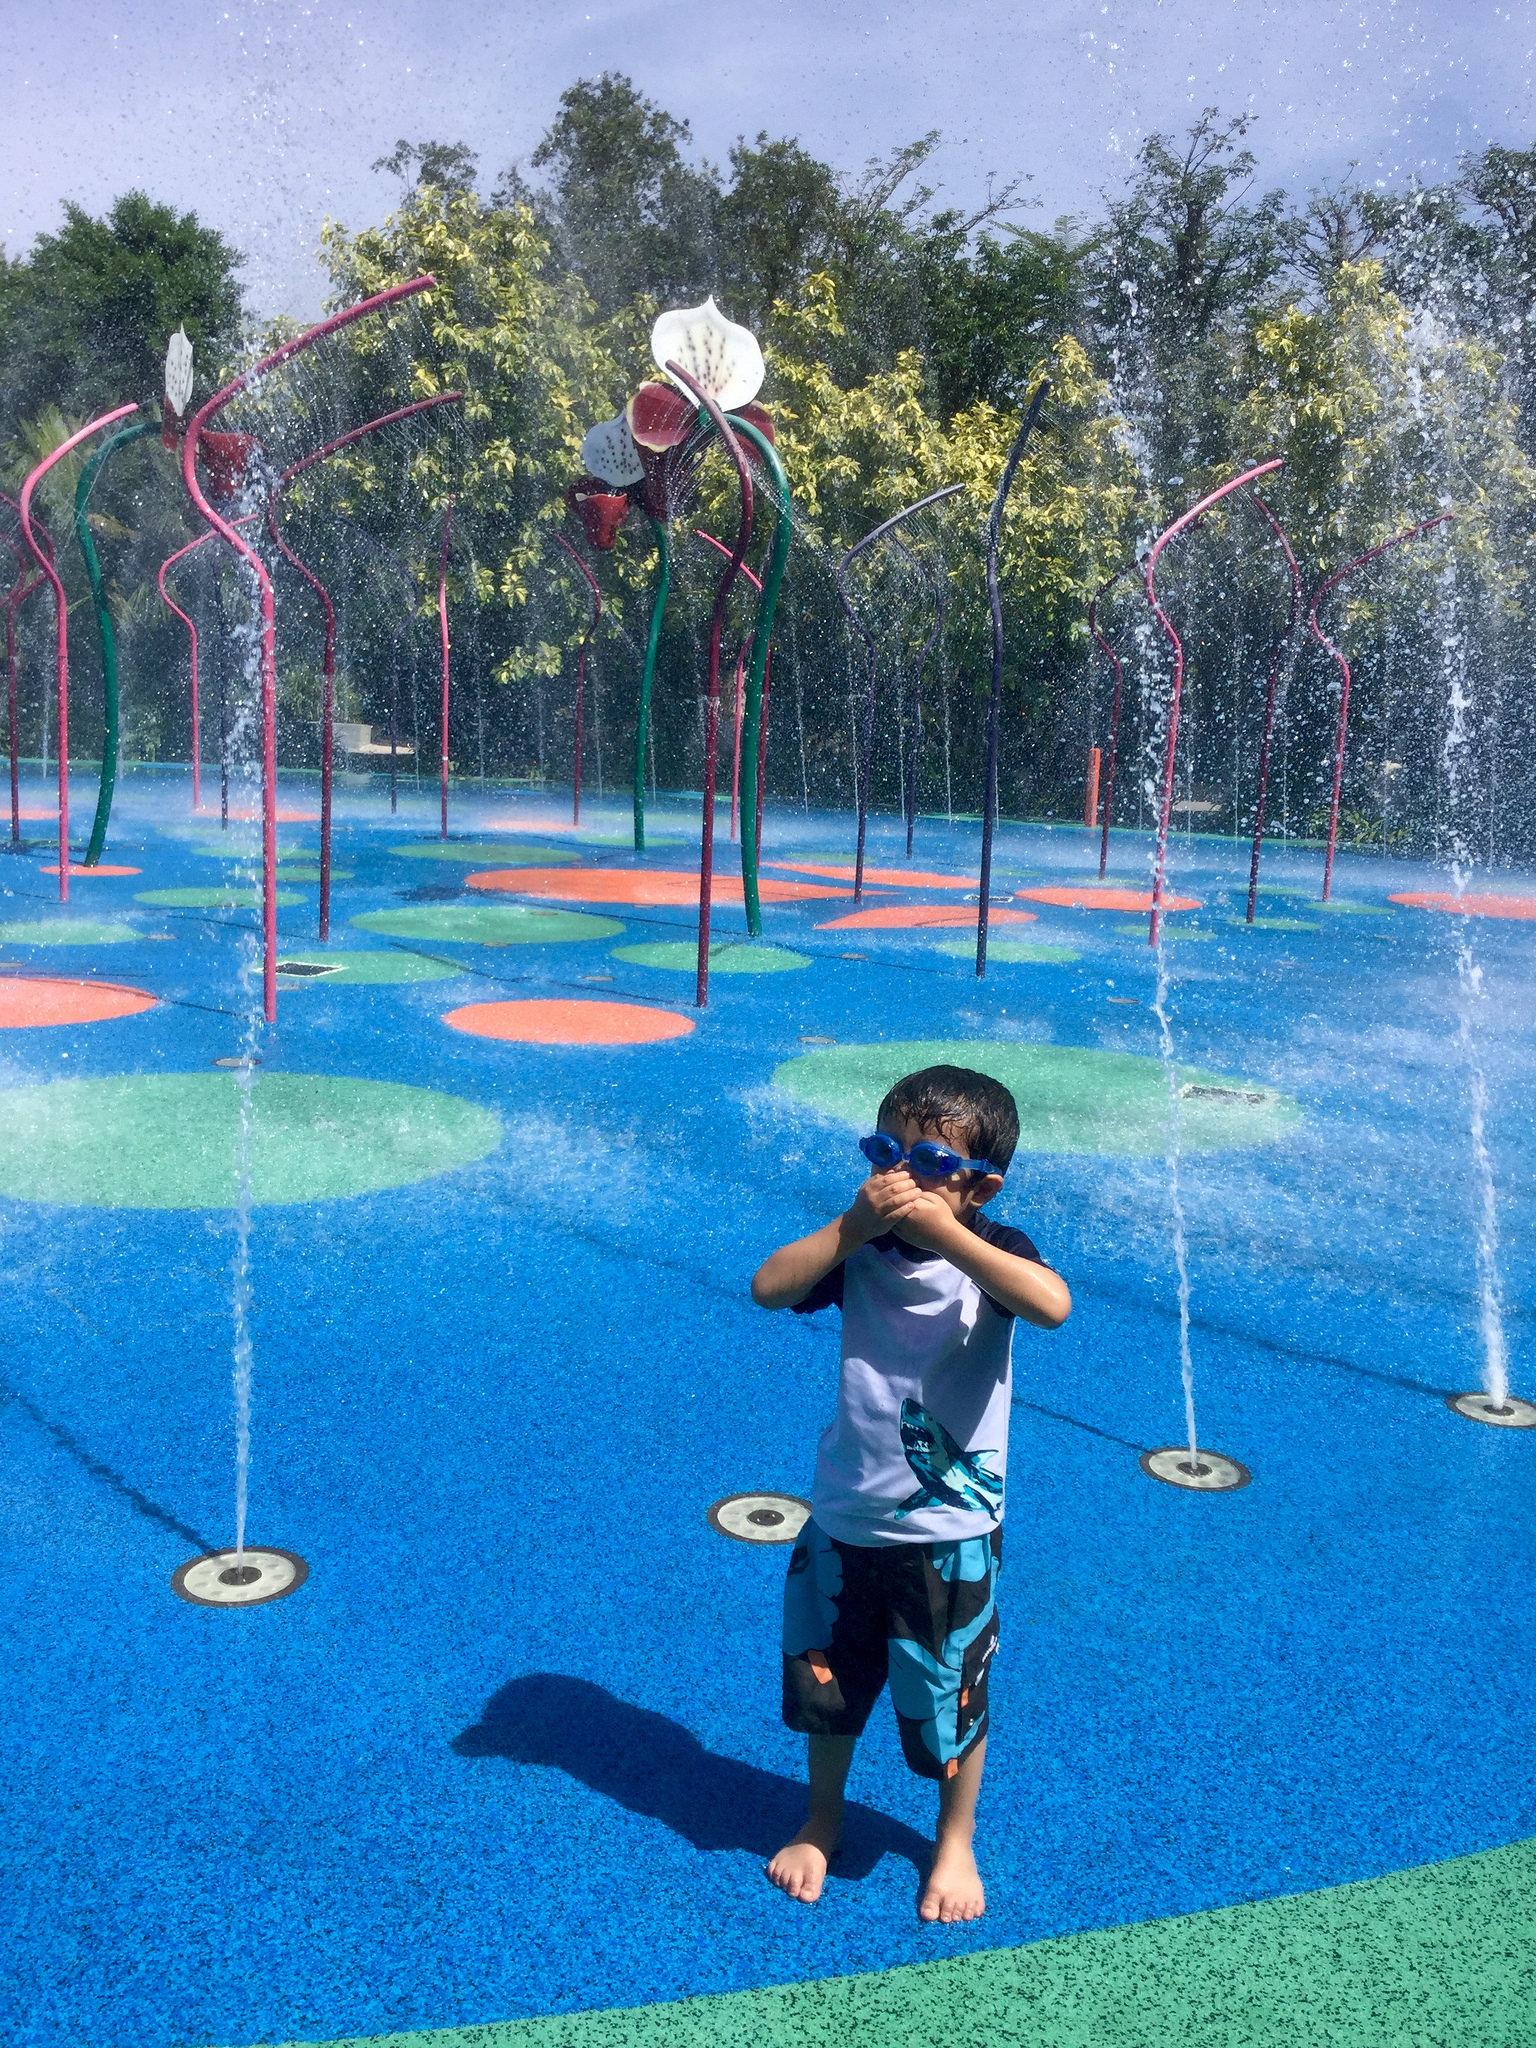 far east organisation children's garden water park kids